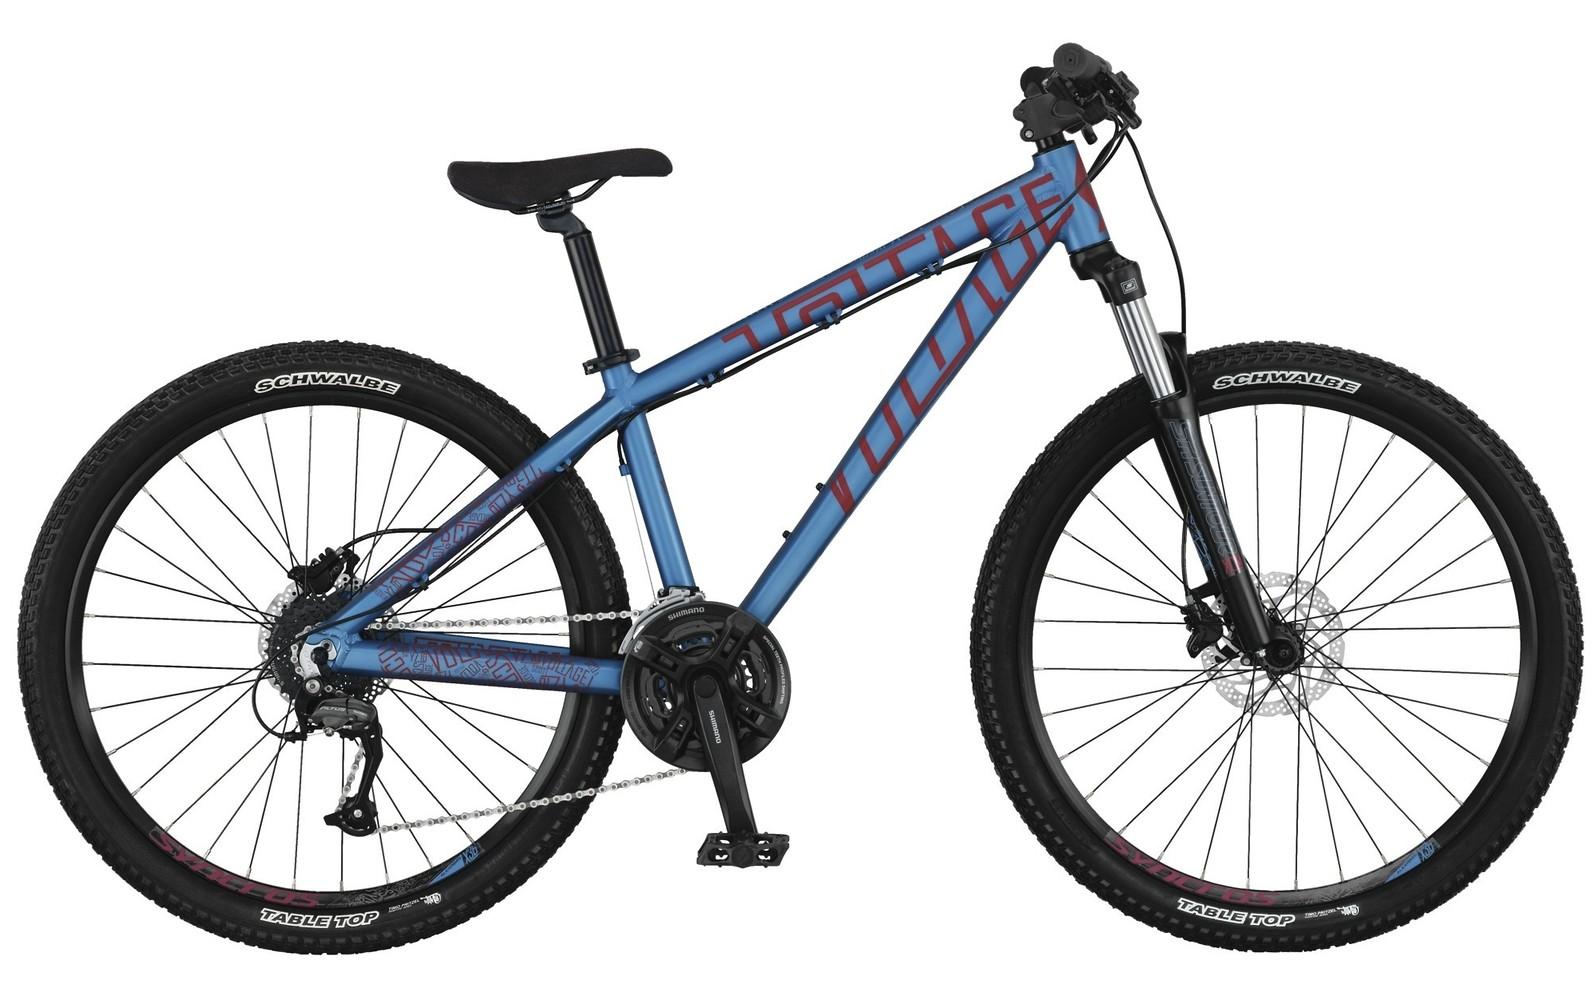 2014 Scott Voltage YZ 20 Bike SCOTT Voltage YZ 20 Bike - blue